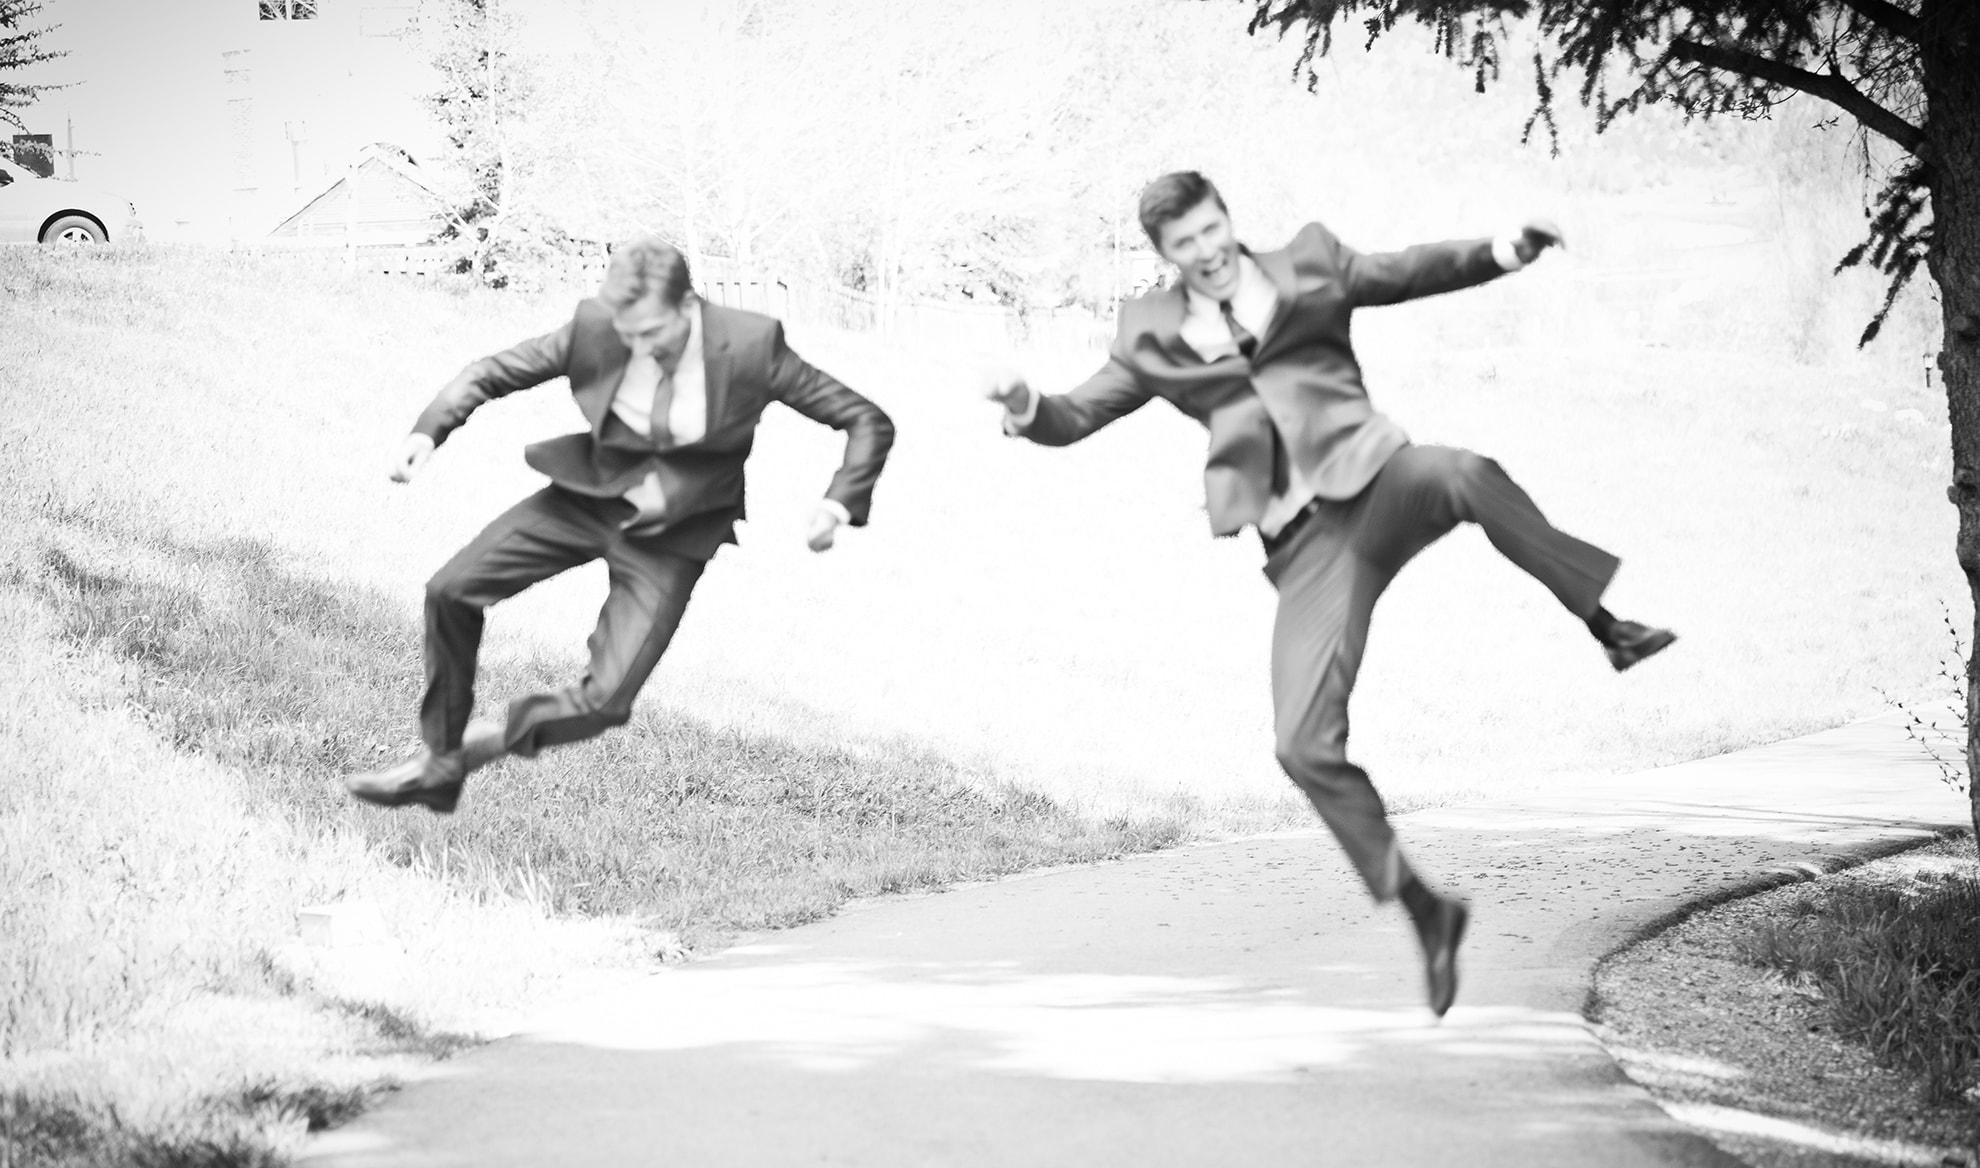 Dr. Jonathan Haerter and Dr. Matthew Hawn having fun.